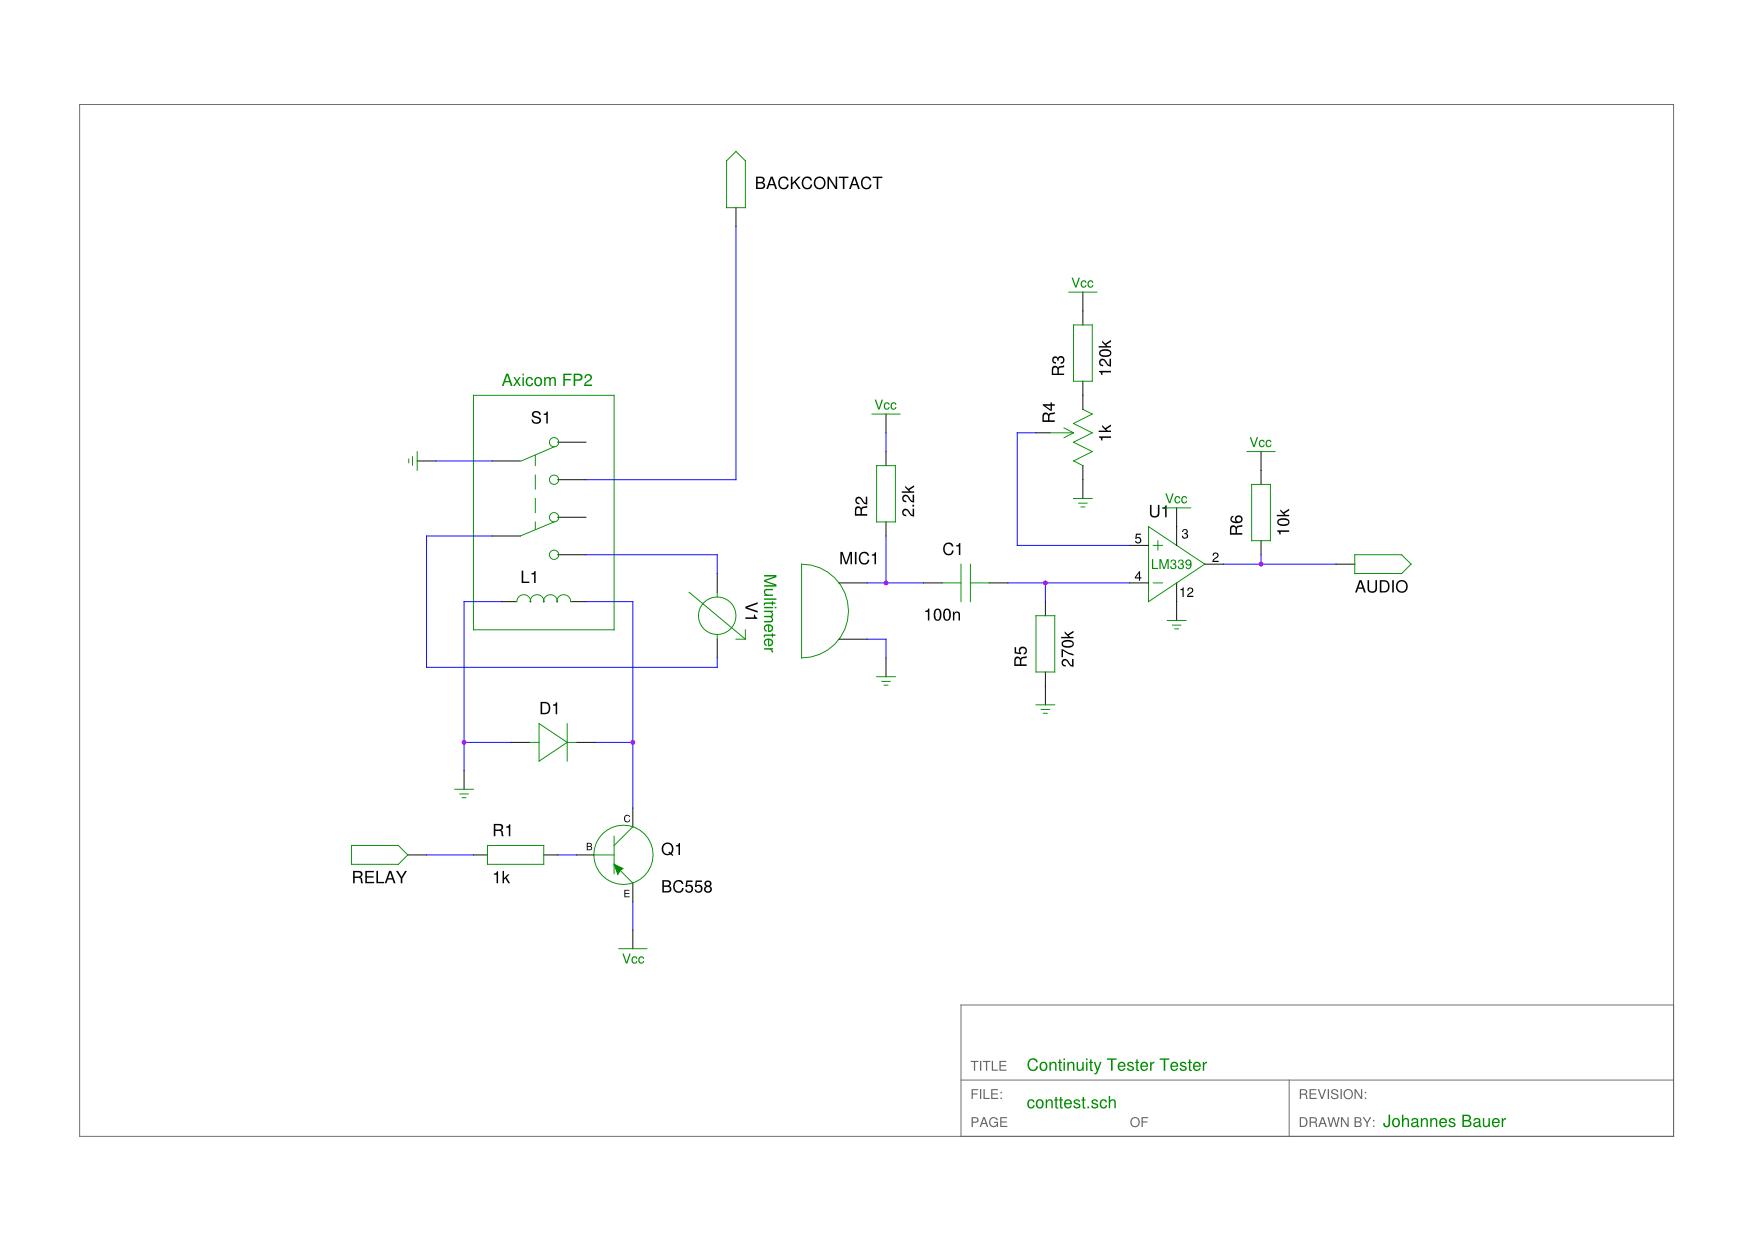 Continuity tester tester continuity tester schematic ccuart Choice Image